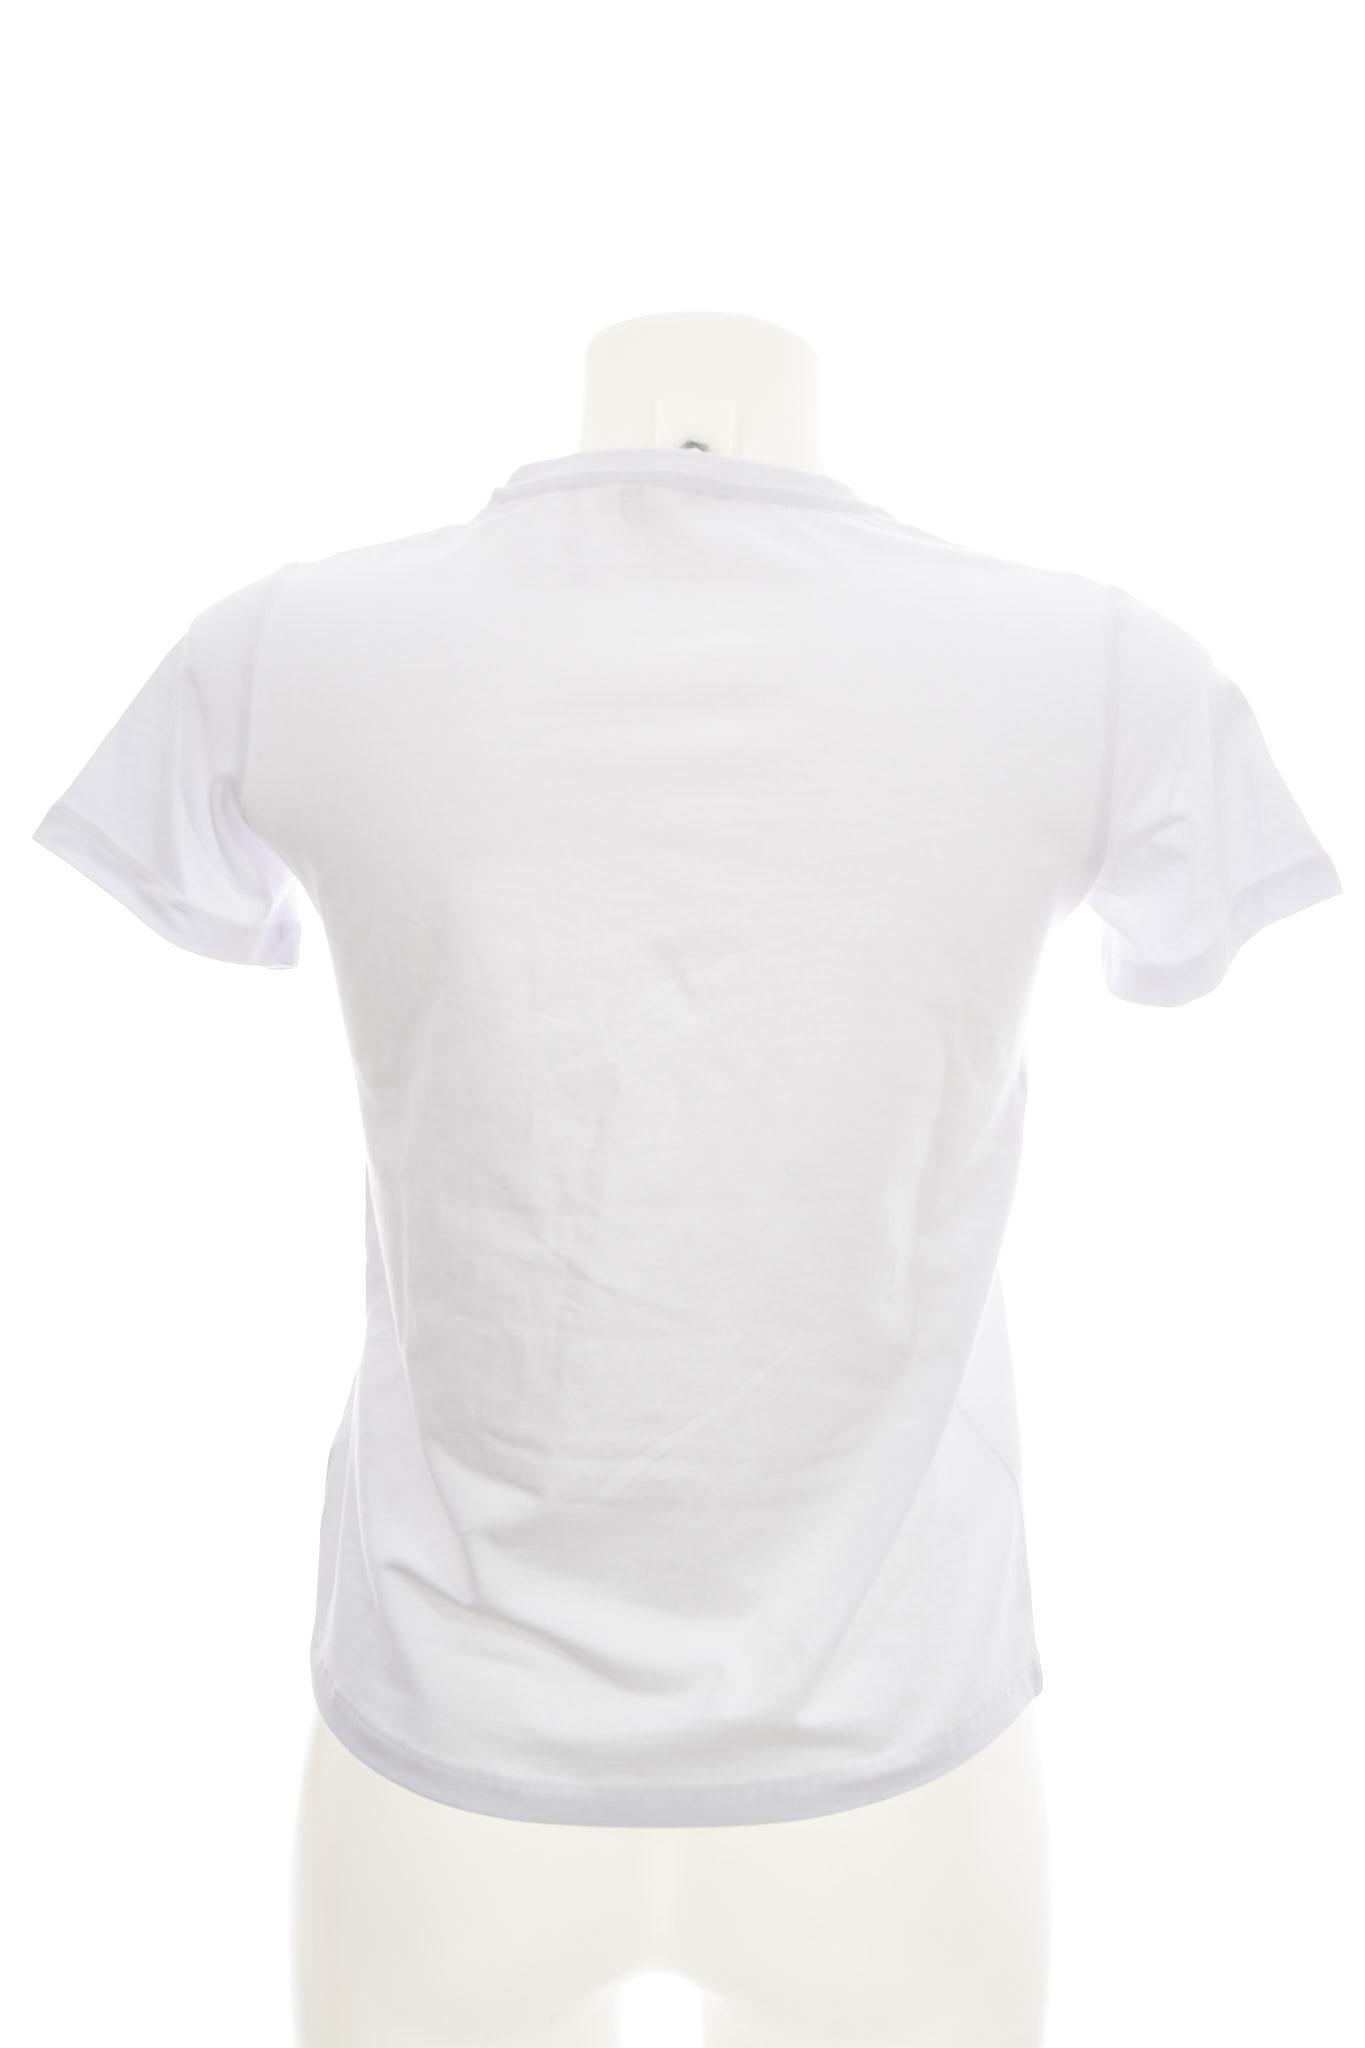 T-shirt FRACOMINA | T-shirt | F120W01006J00140278